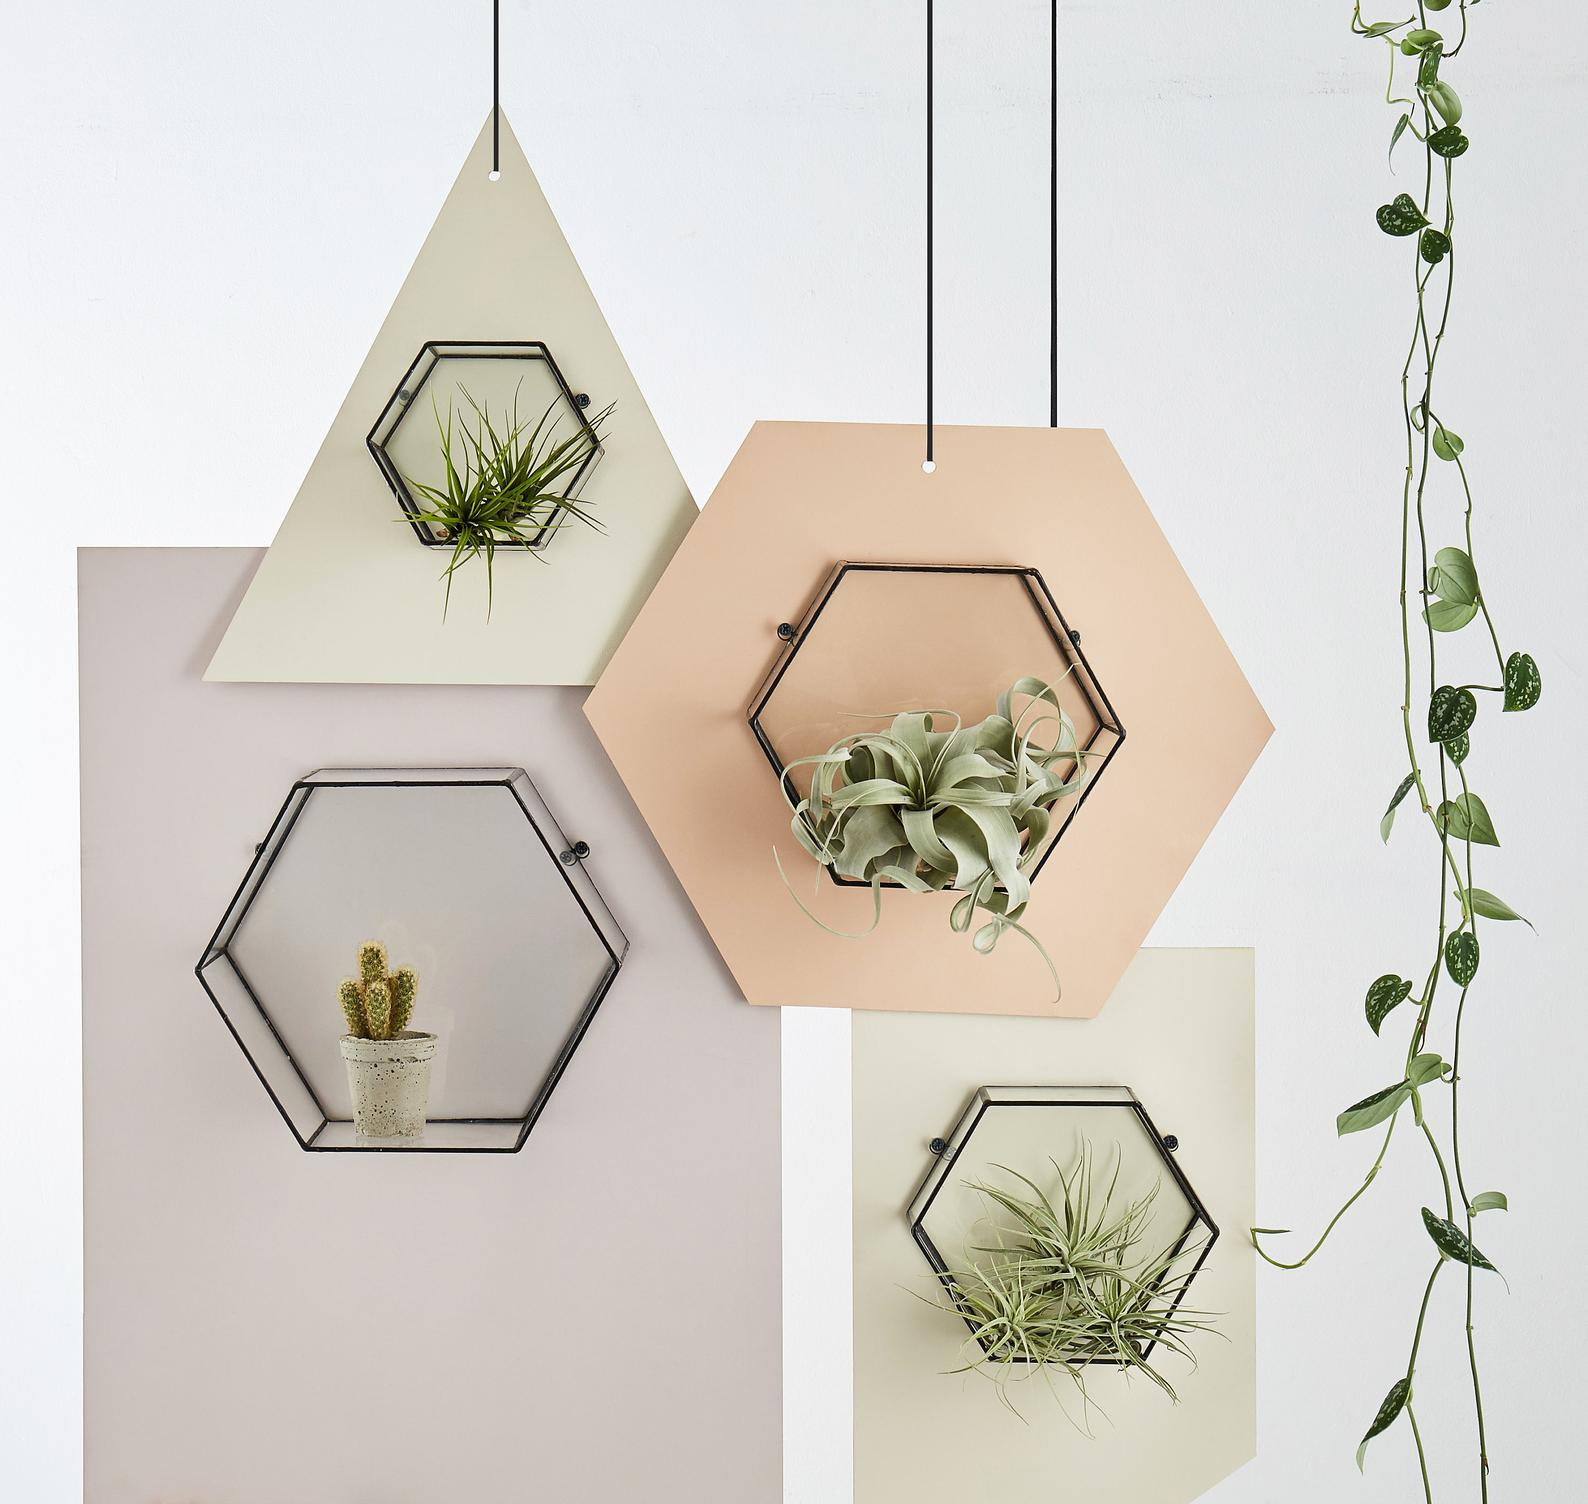 Varro Hexagon Glass Wall Display Shelf By Monti by Monti